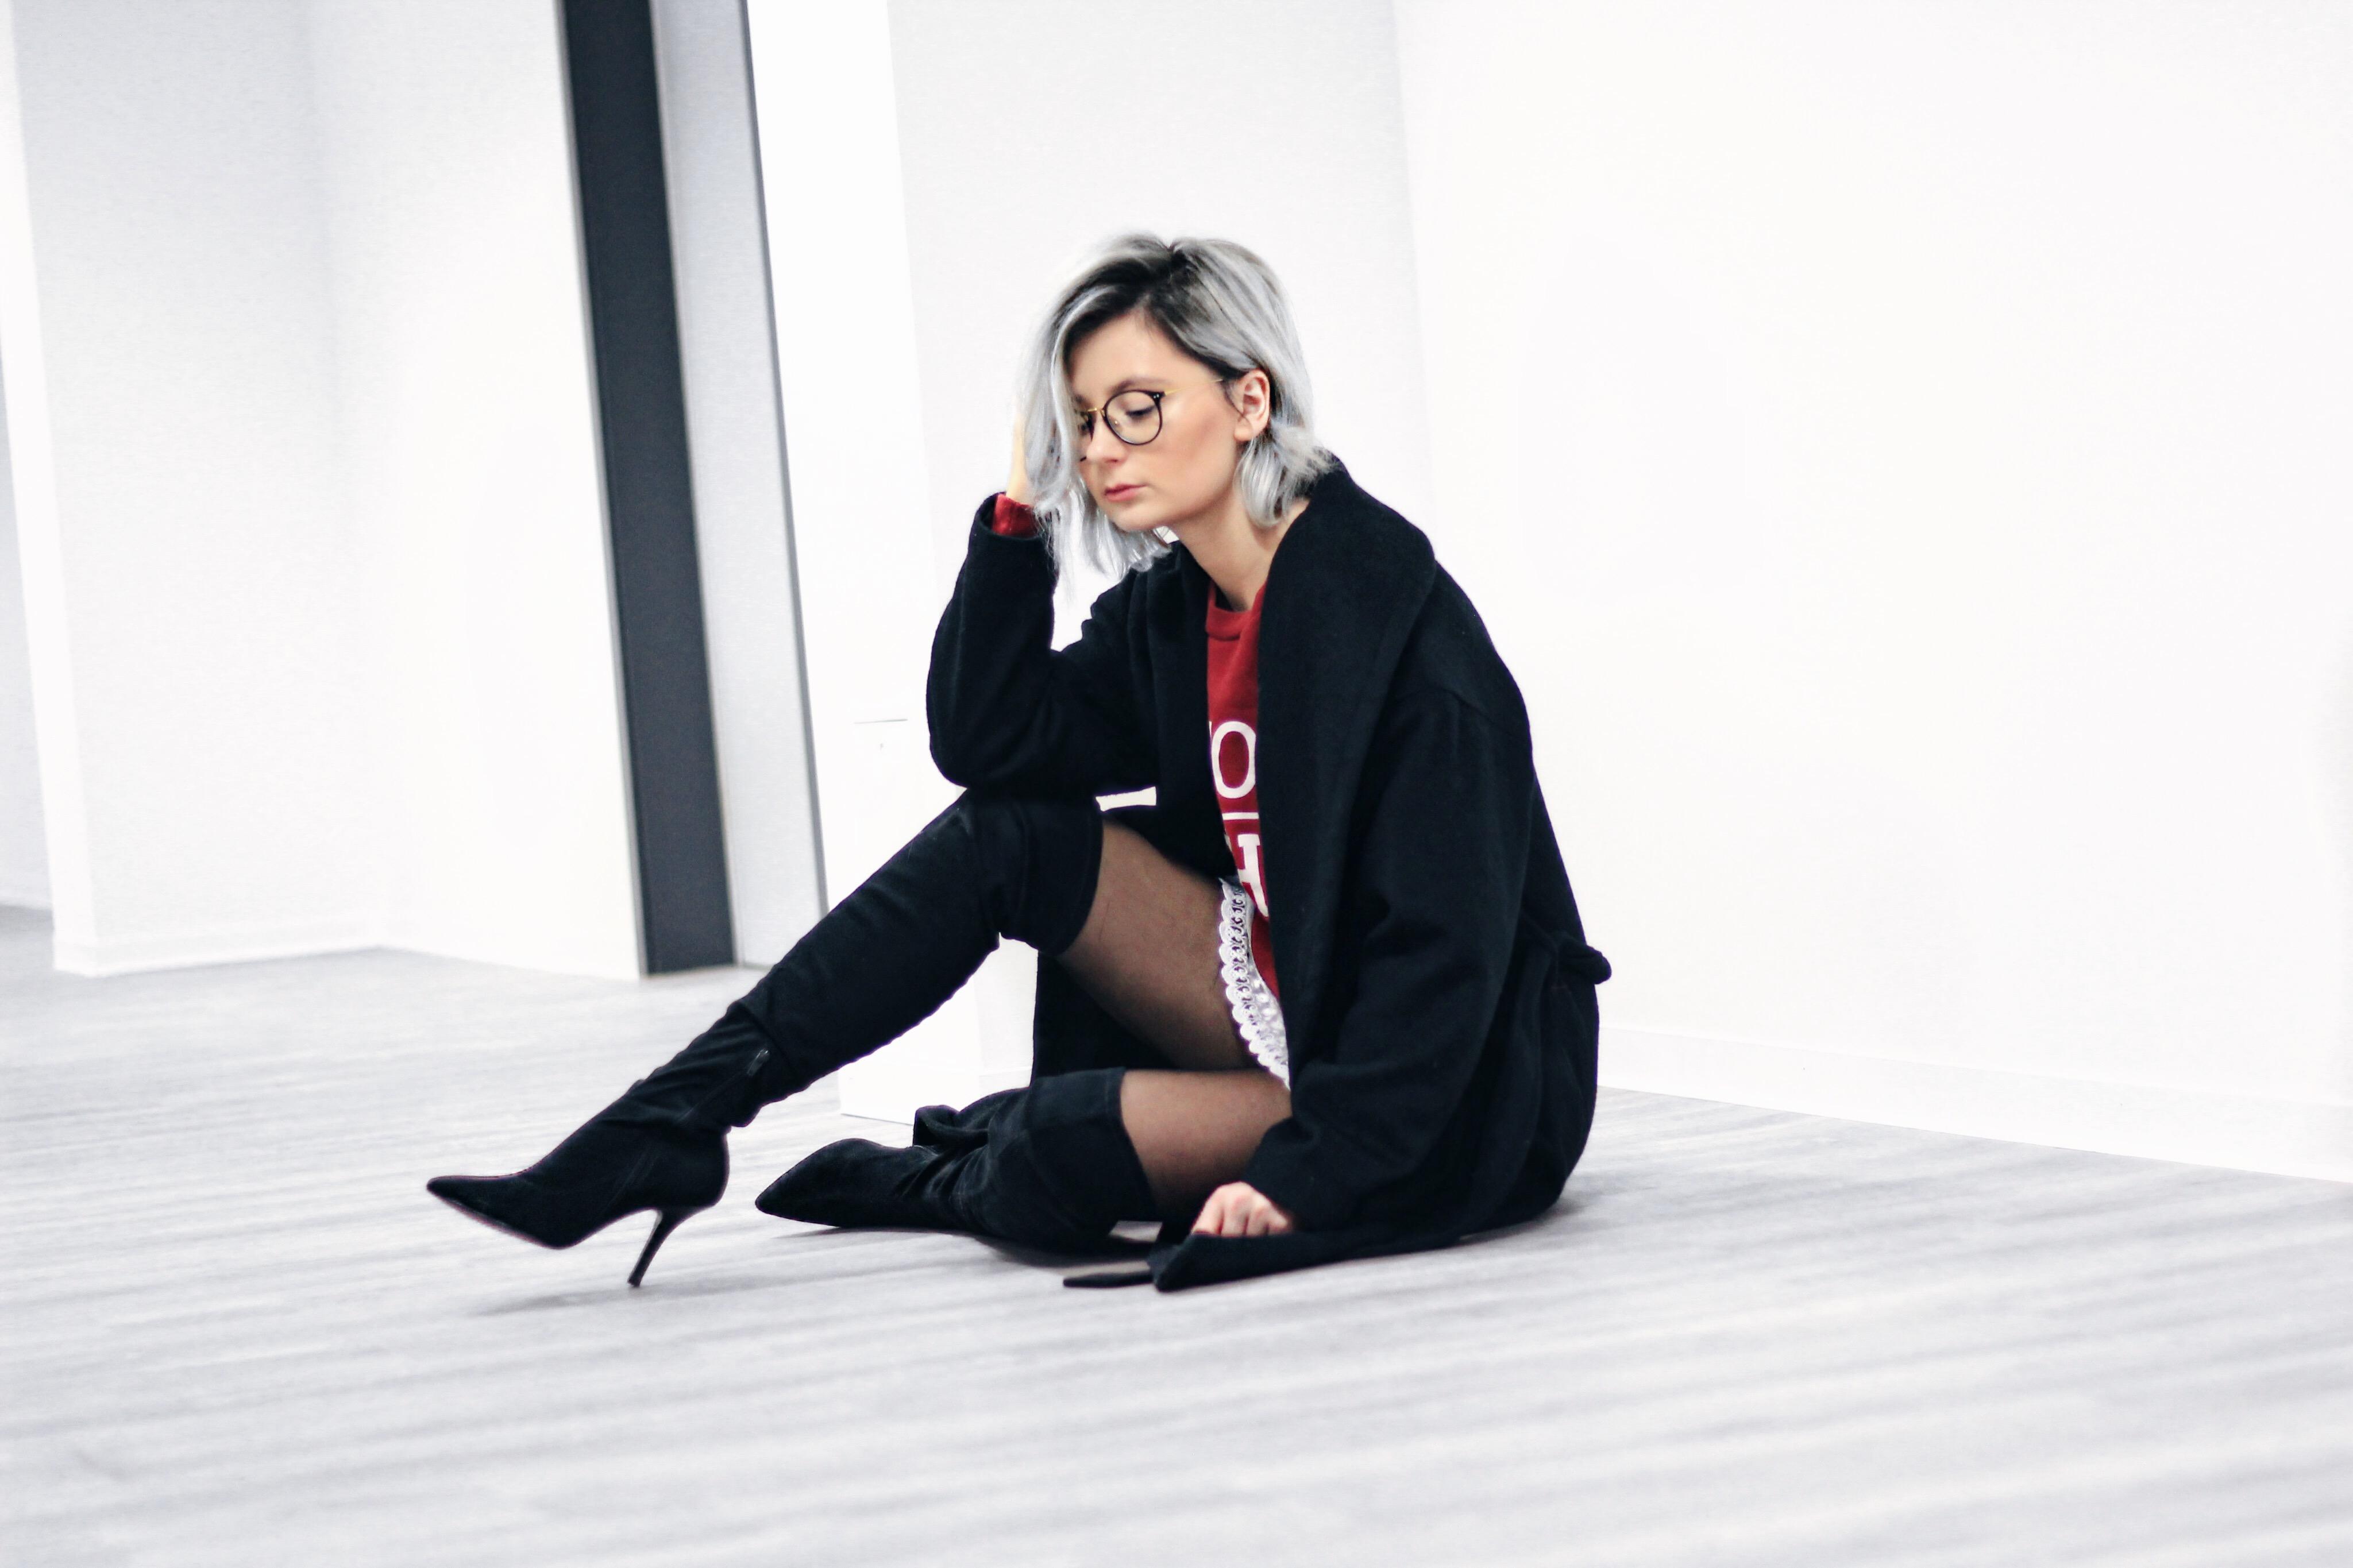 Modeblogger, Modeblog, Fashionblog, Fashionblogger, Mannheim, Heidelberg, Frankfurt, Outfit, OOTD, Lookbook, Fashionista, Instagram, Trend, Dear Fashion Blog, Lisa Jasmin